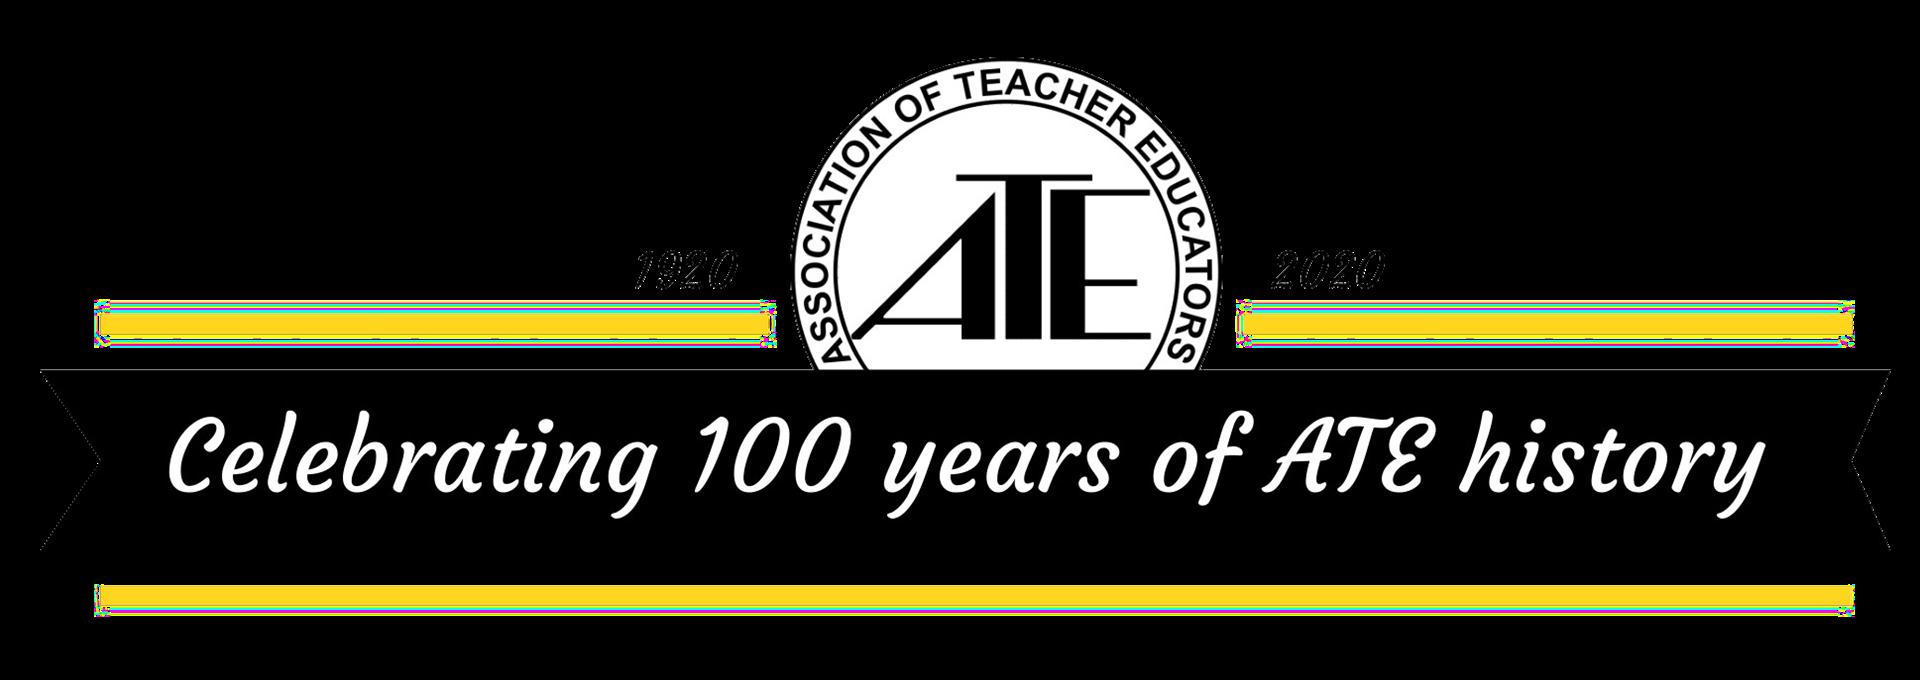 Association of Teacher Educators - Home